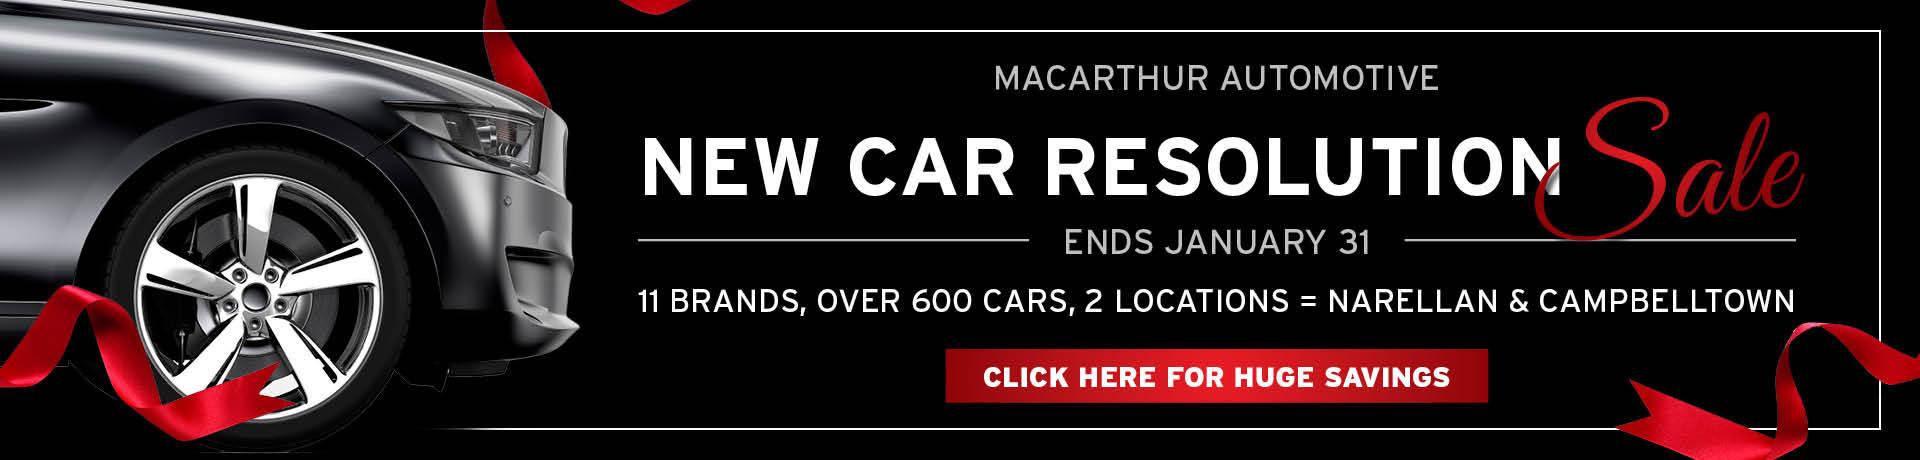 Macarthur Automotive - New Car Resolution Sale